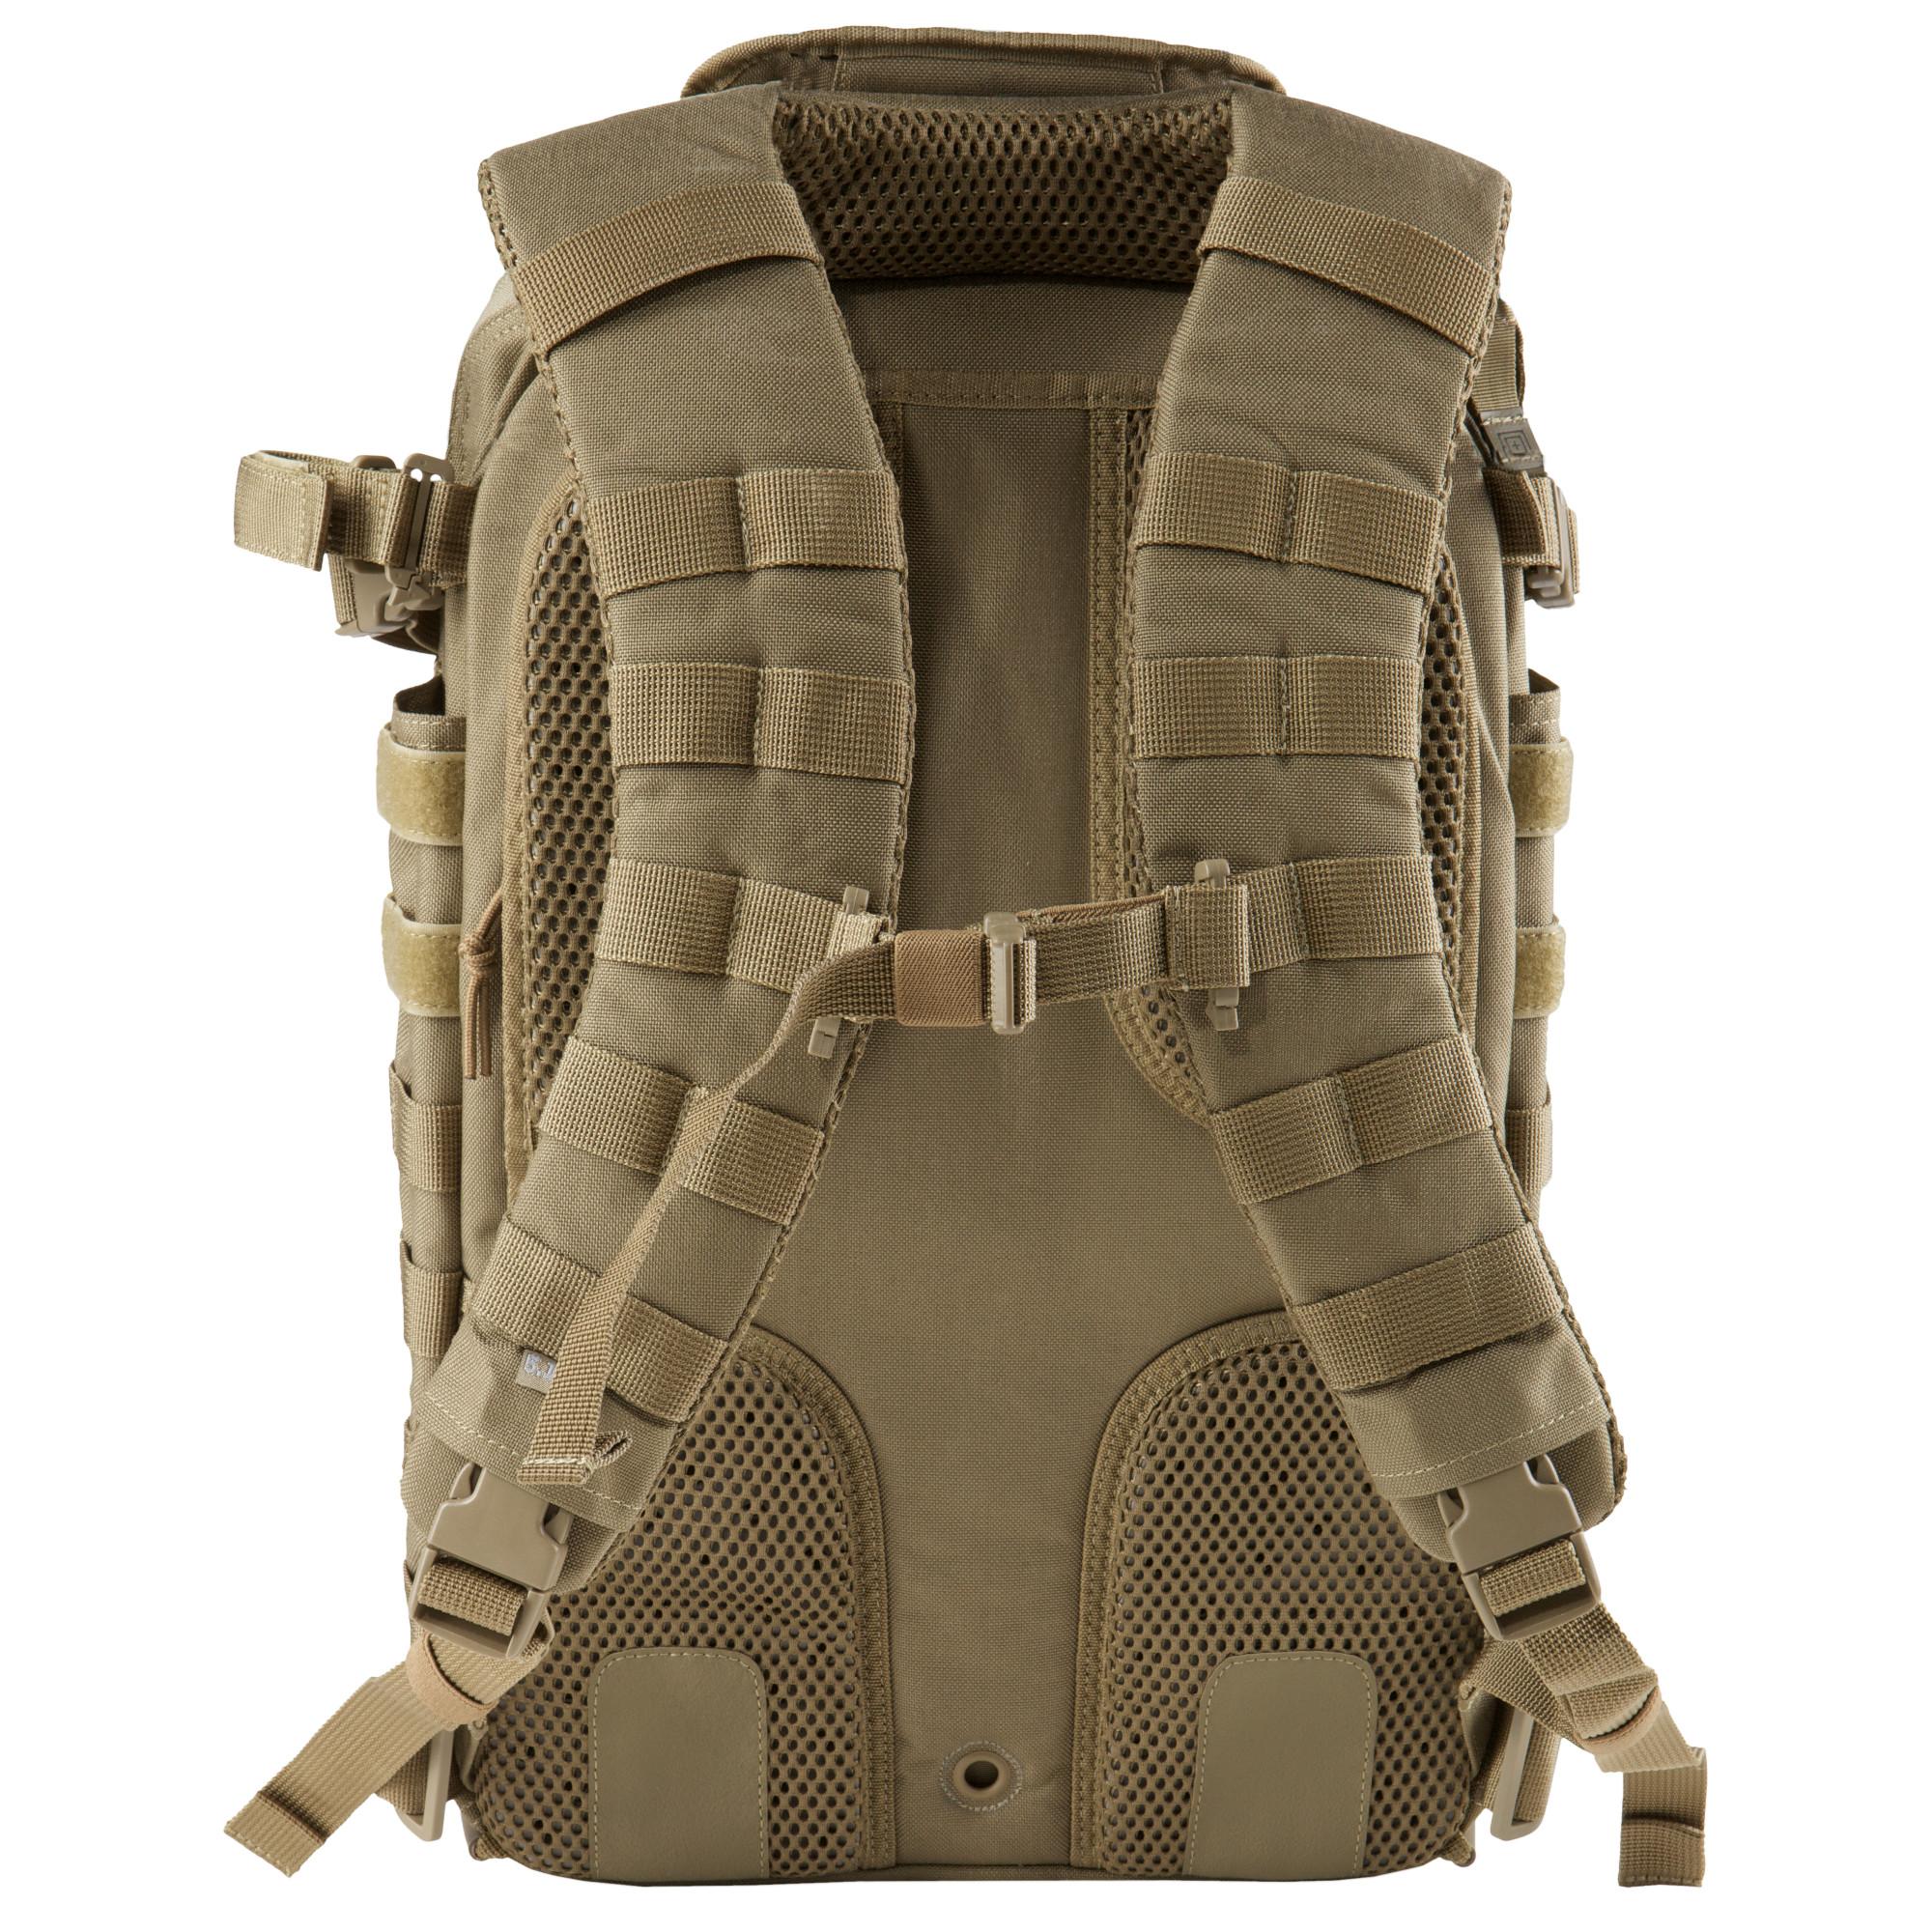 Balo 5.11 Tactical ALL HAZARDS PRIME 29L – Sandstone